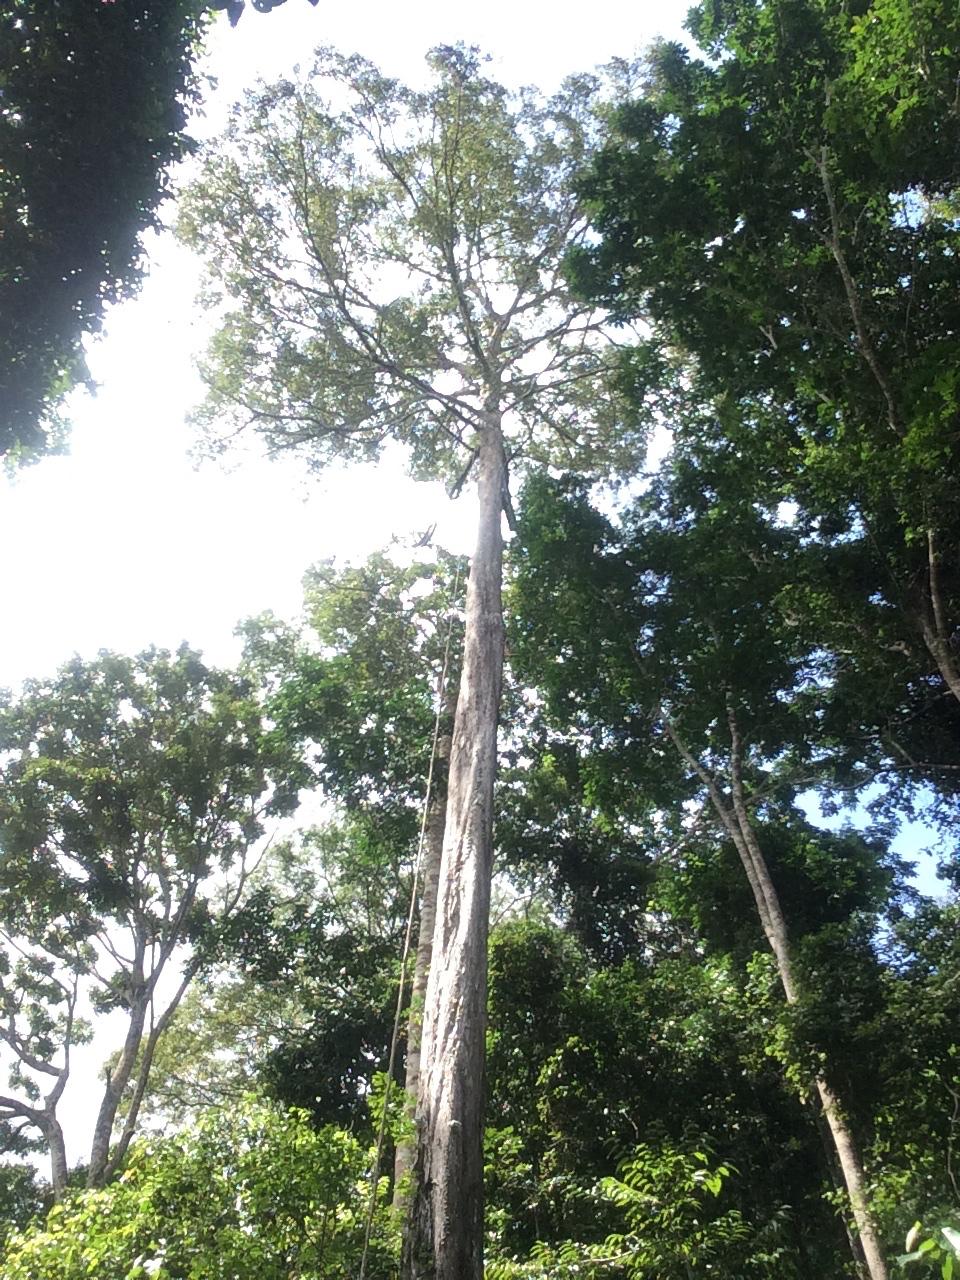 Rainforest Vine Climbing